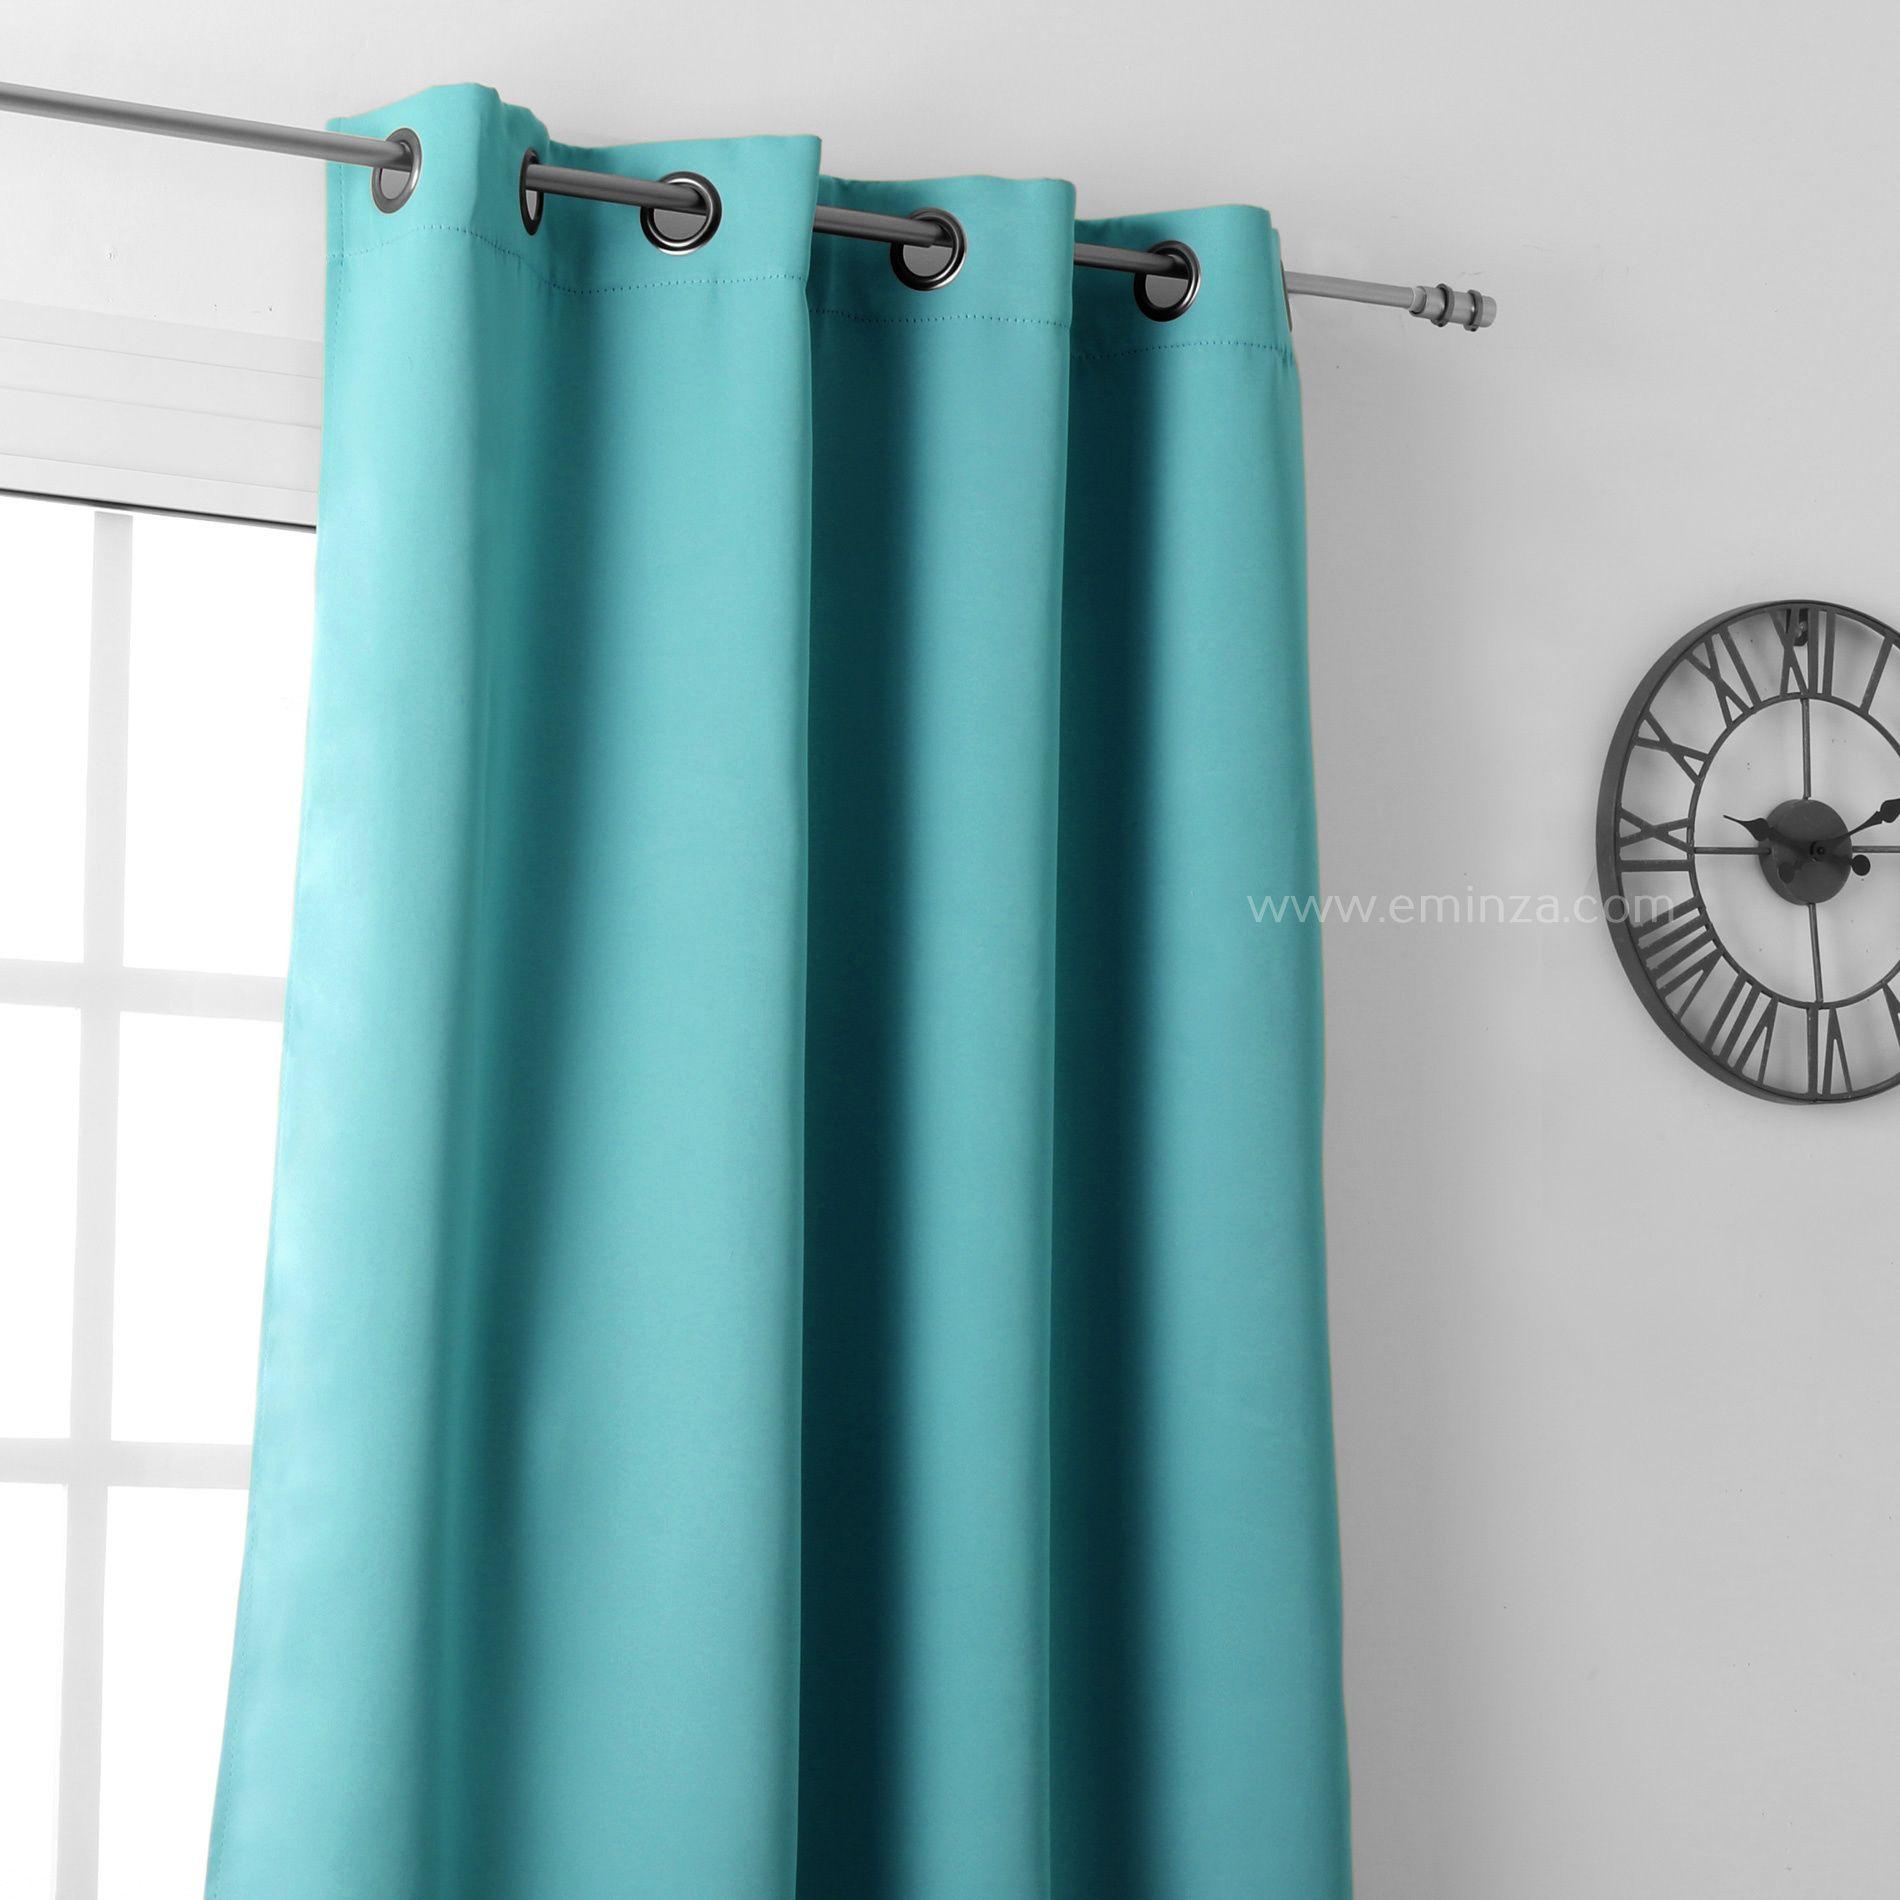 rideau occultant bleu marine top rideau occultant chambre couleur chambre fille garcon rideau. Black Bedroom Furniture Sets. Home Design Ideas